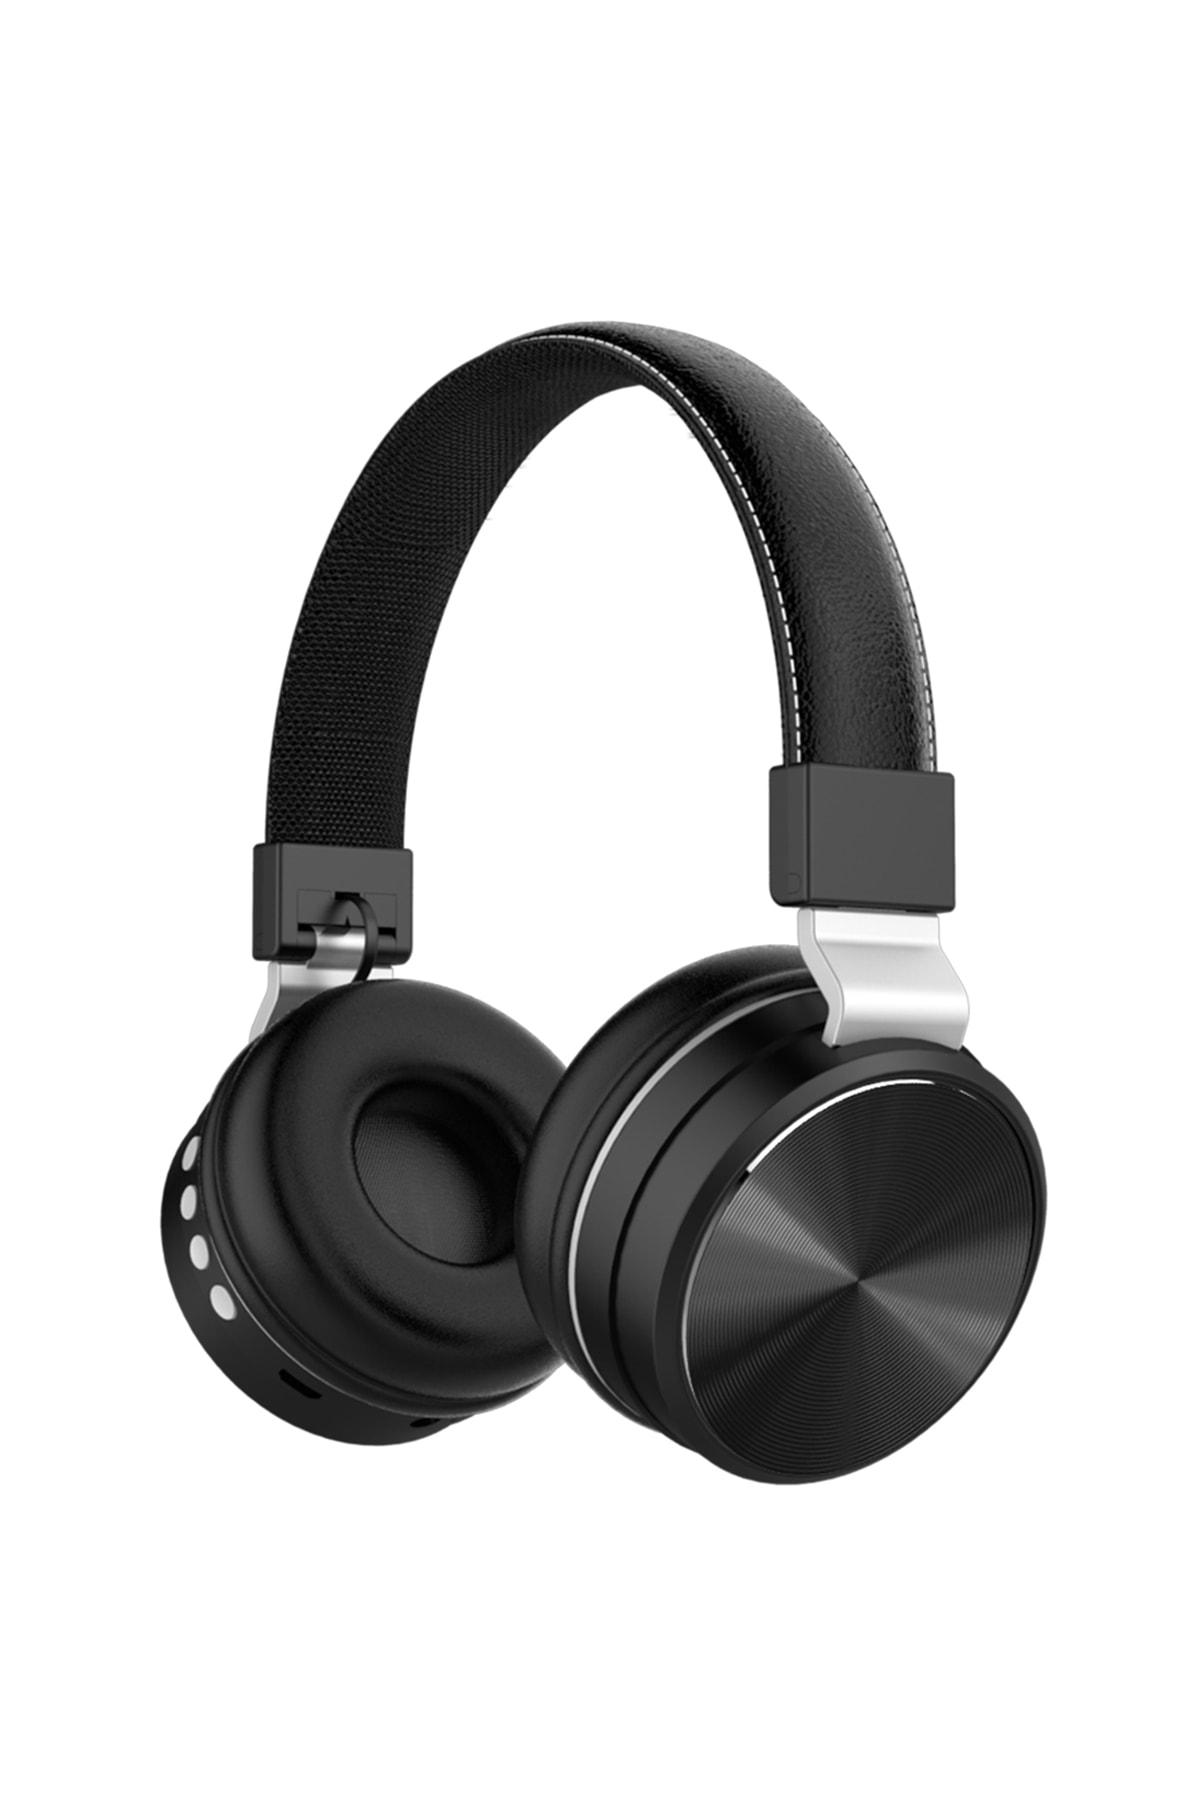 Mkey Xb240 Profesyonel Kulaklık, Mikrofonlu Gaming Kulaklık, Bluetooth 5.0, Kablosuz Kulaküstü Kulaklık 1